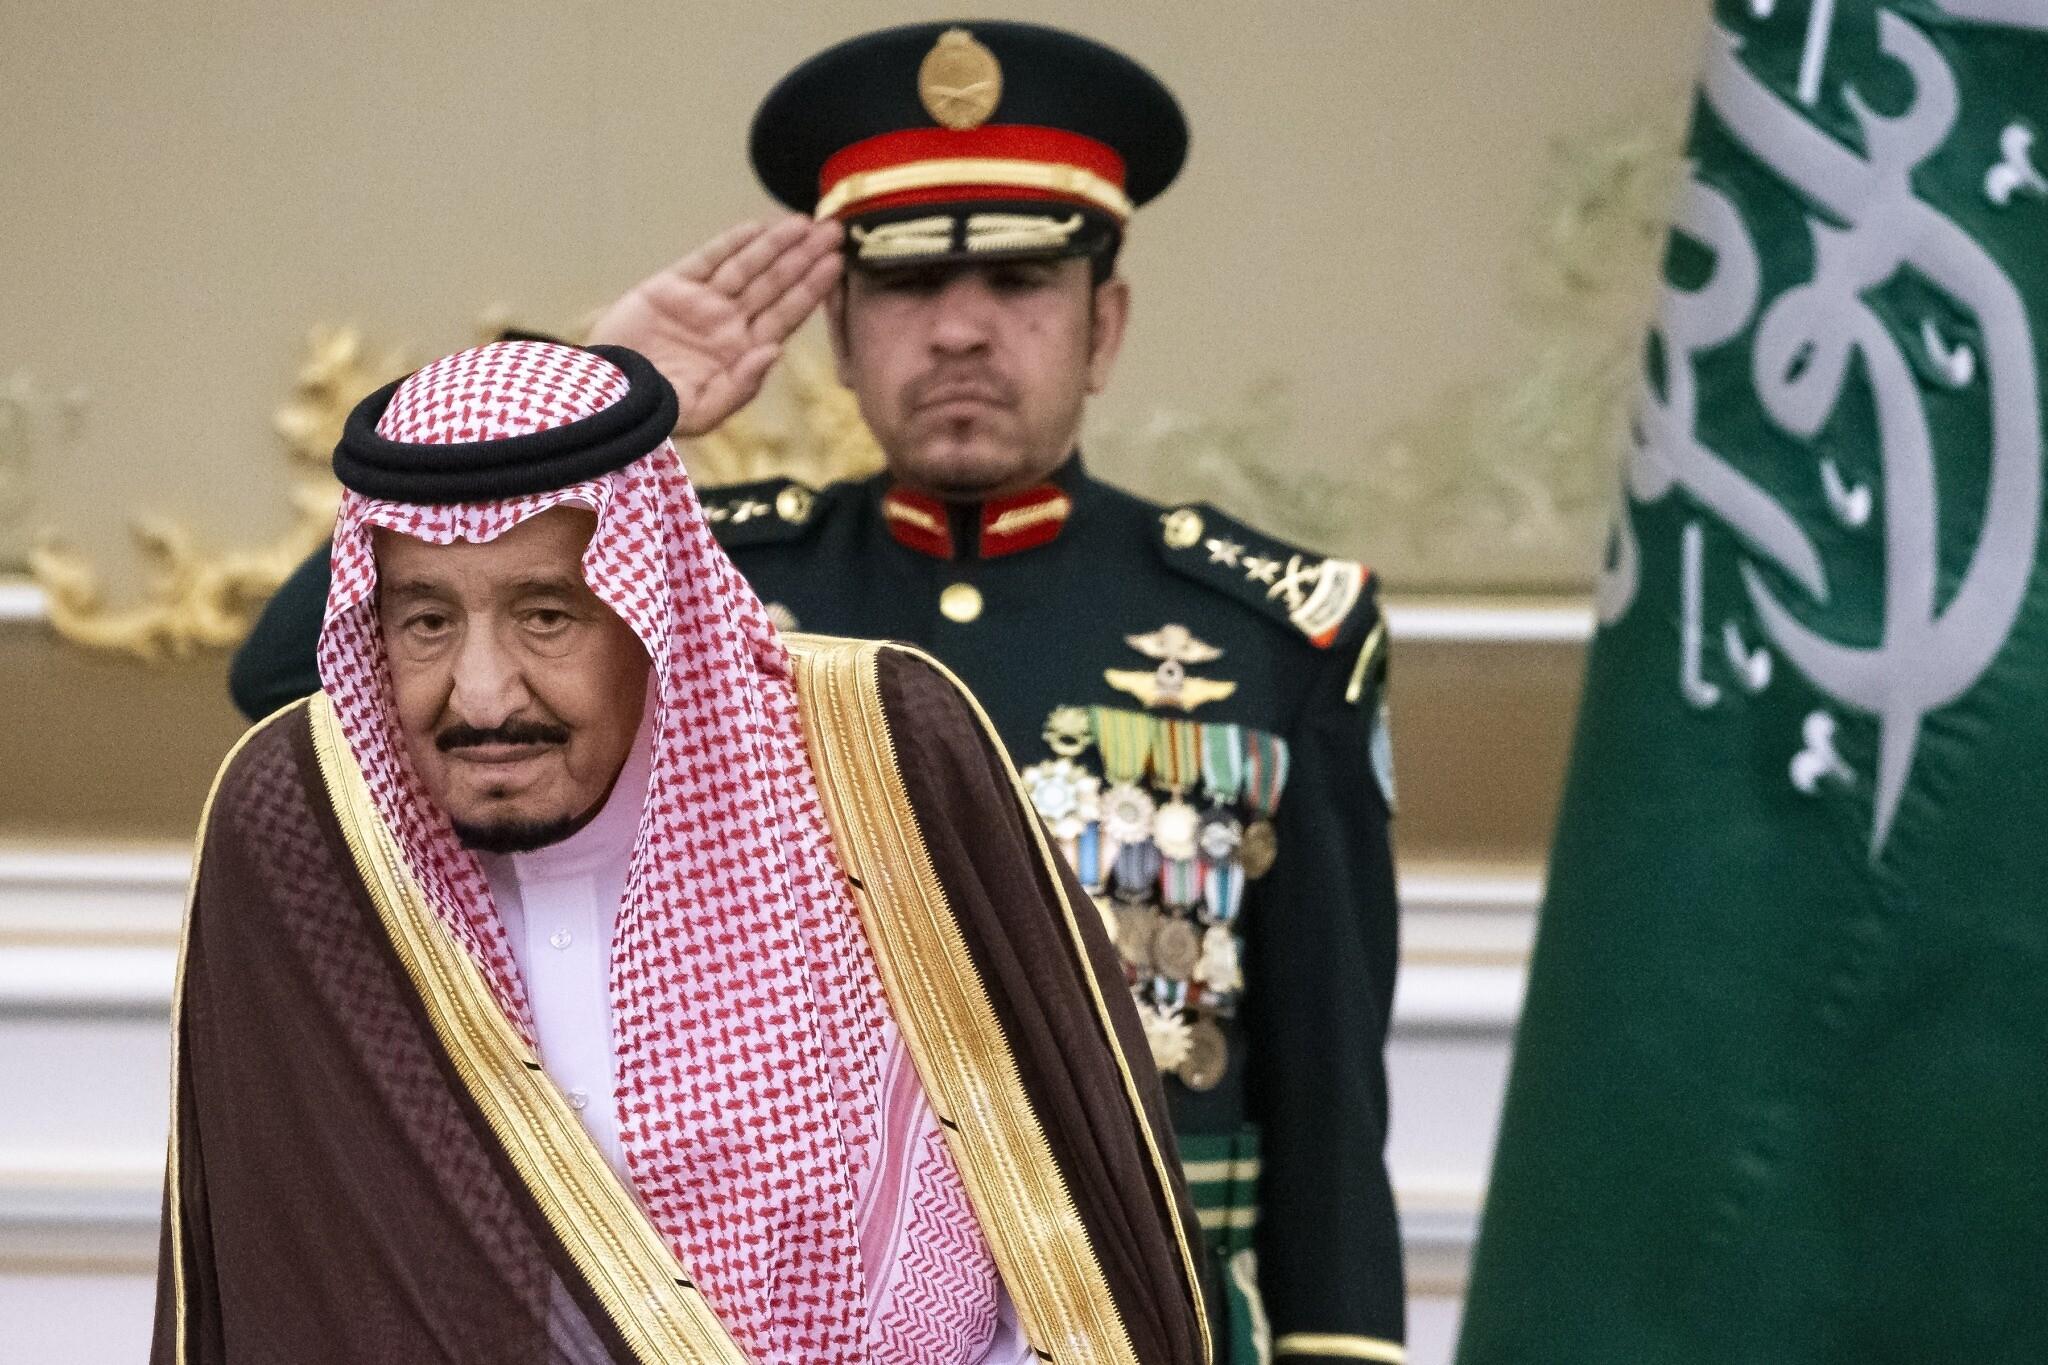 saudiarabiaendsdeathpenaltyforcrimescommittedbyminors